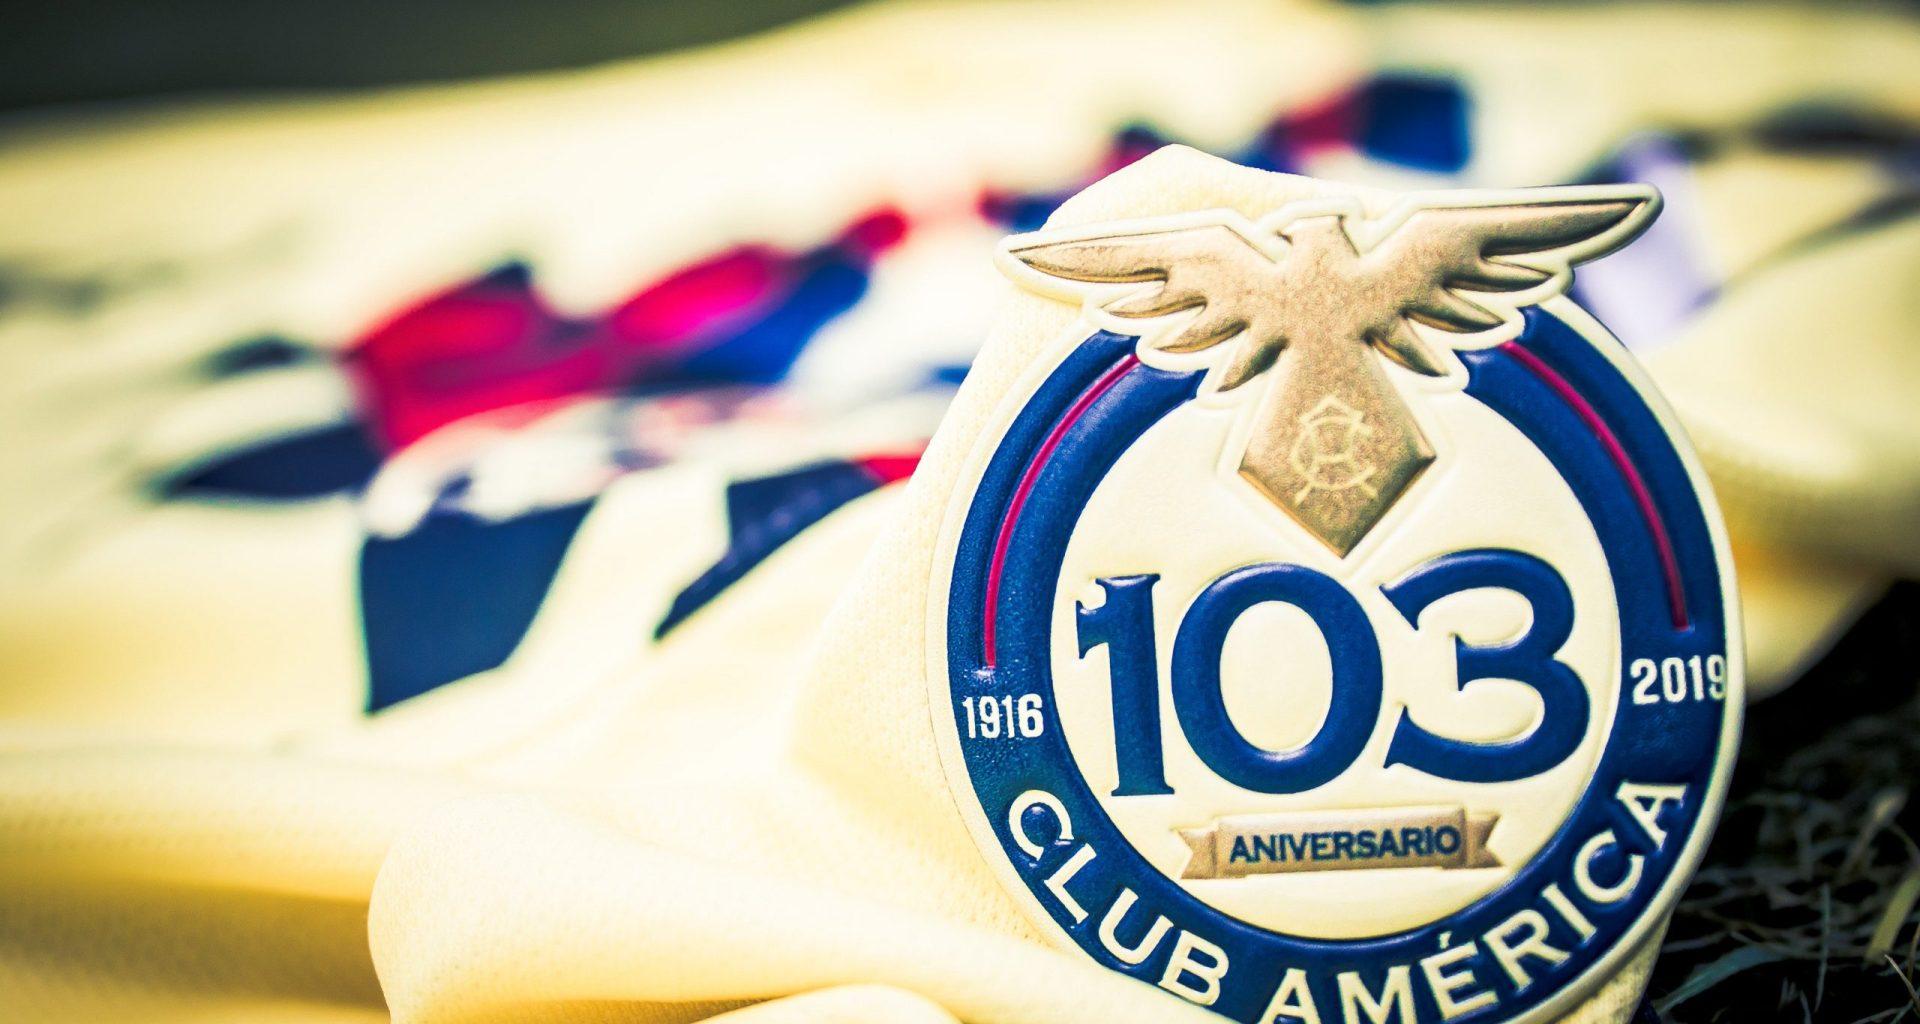 Aniversario_103_Club_America